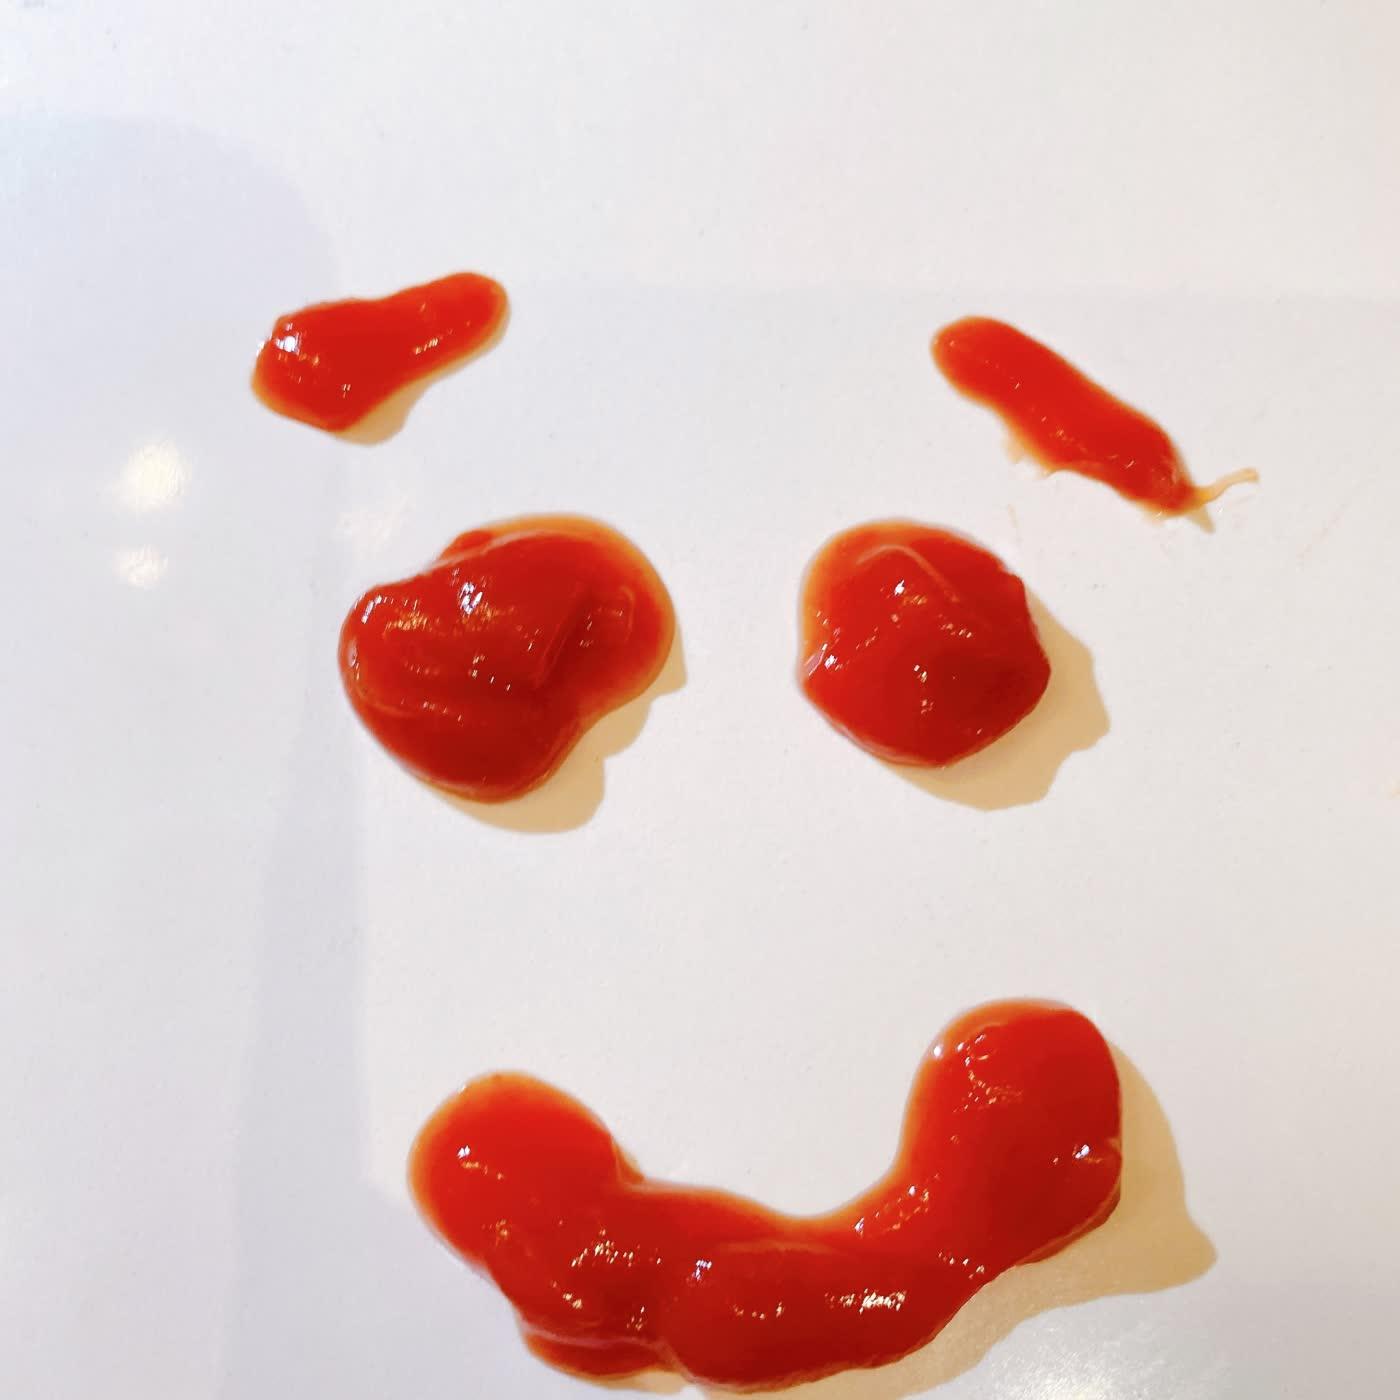 陶爾CP蕃茄醬